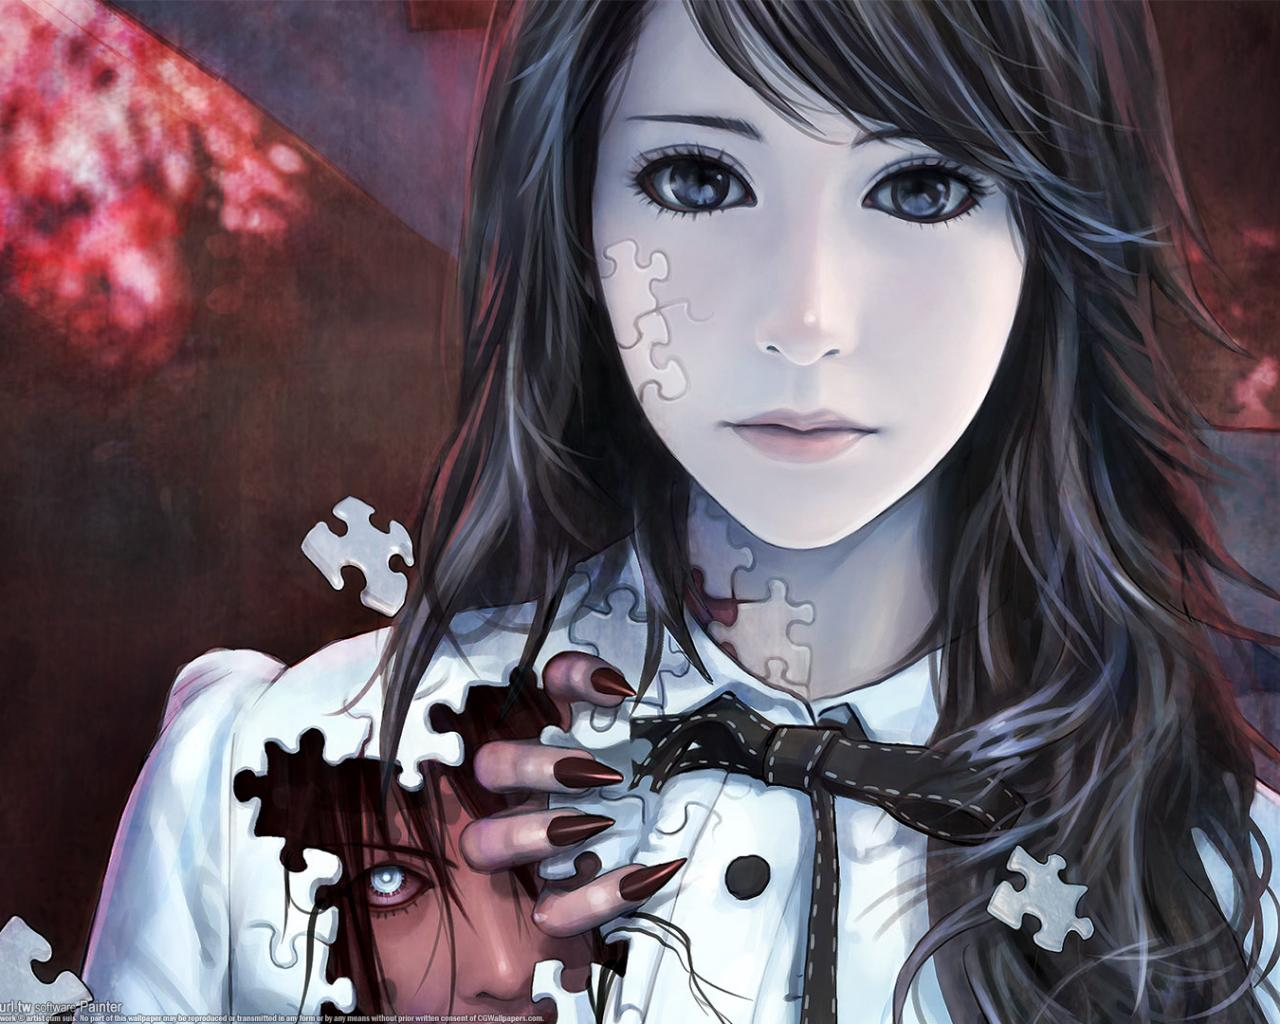 Wallpaper Anime Girl Keren 3d gambar ke 10